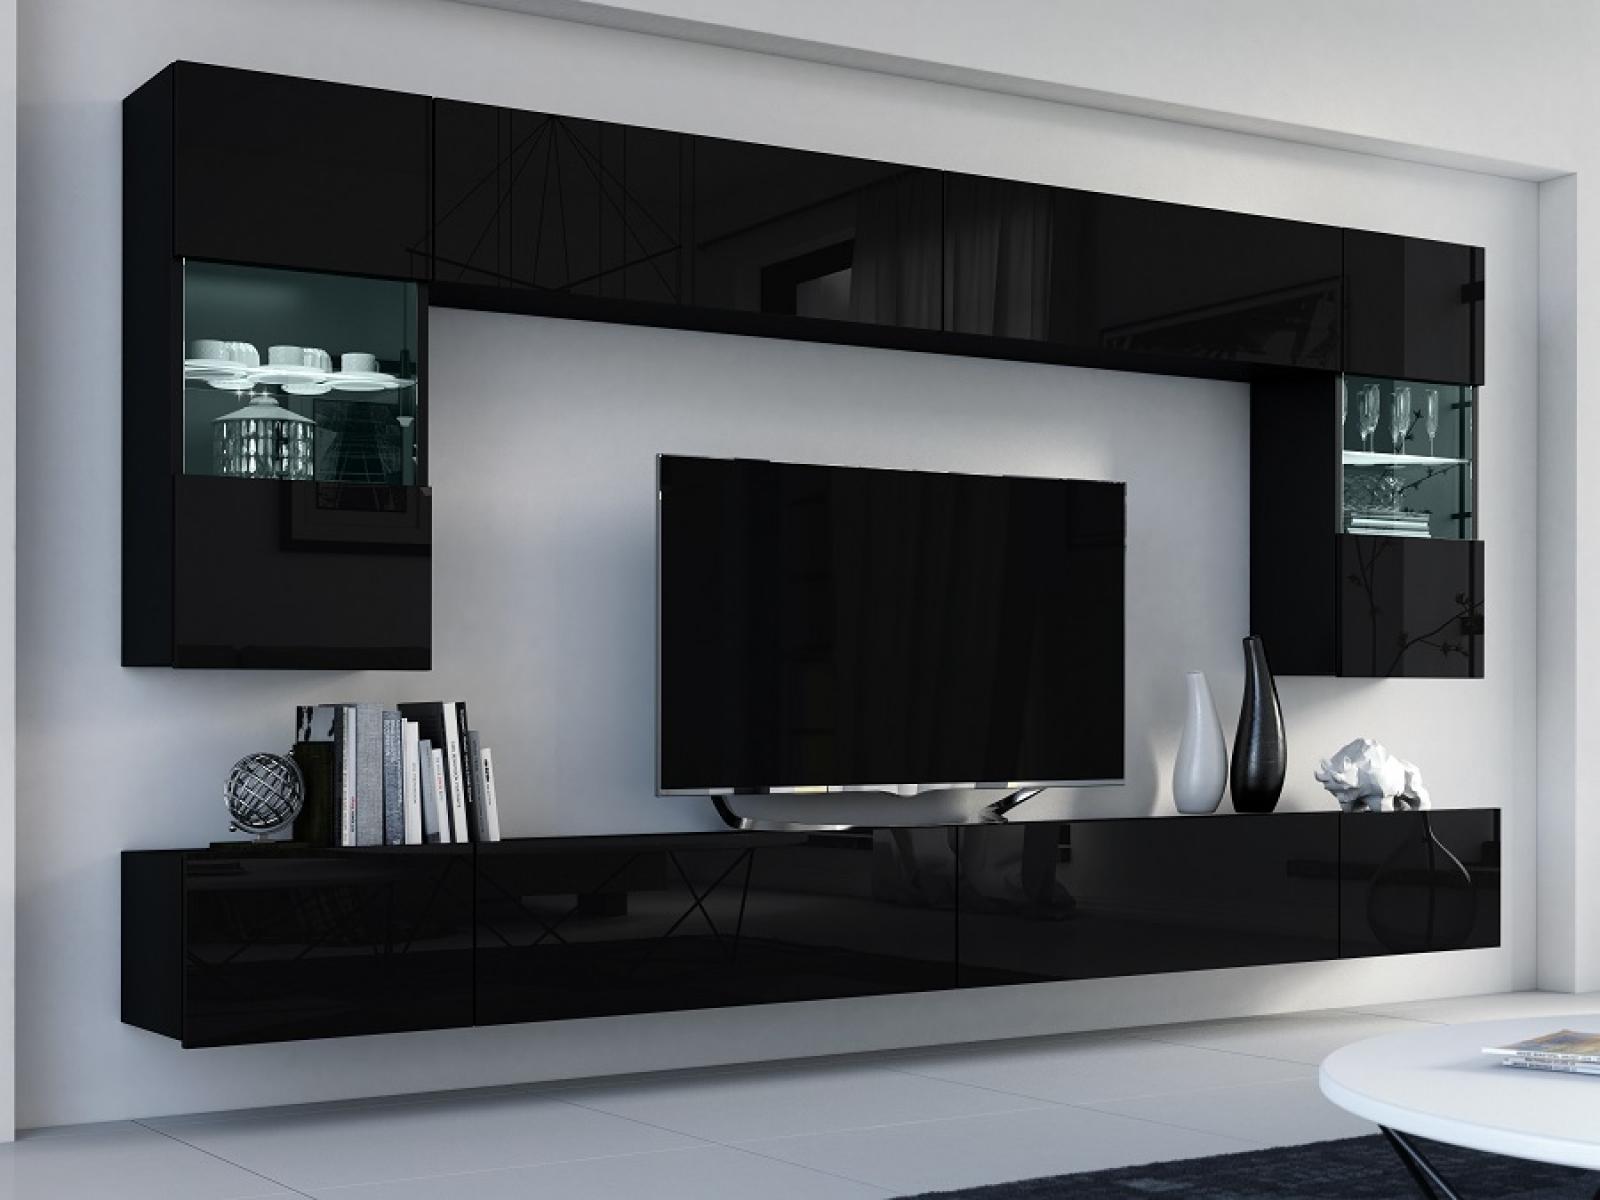 Wohnwand Flow Schwarz Hochglanz/ Schwarz Mediawand Medienwand Design Modern  Led Beleuchtung MDF Hochglanz Hängewand Hängeschrank TV Wand